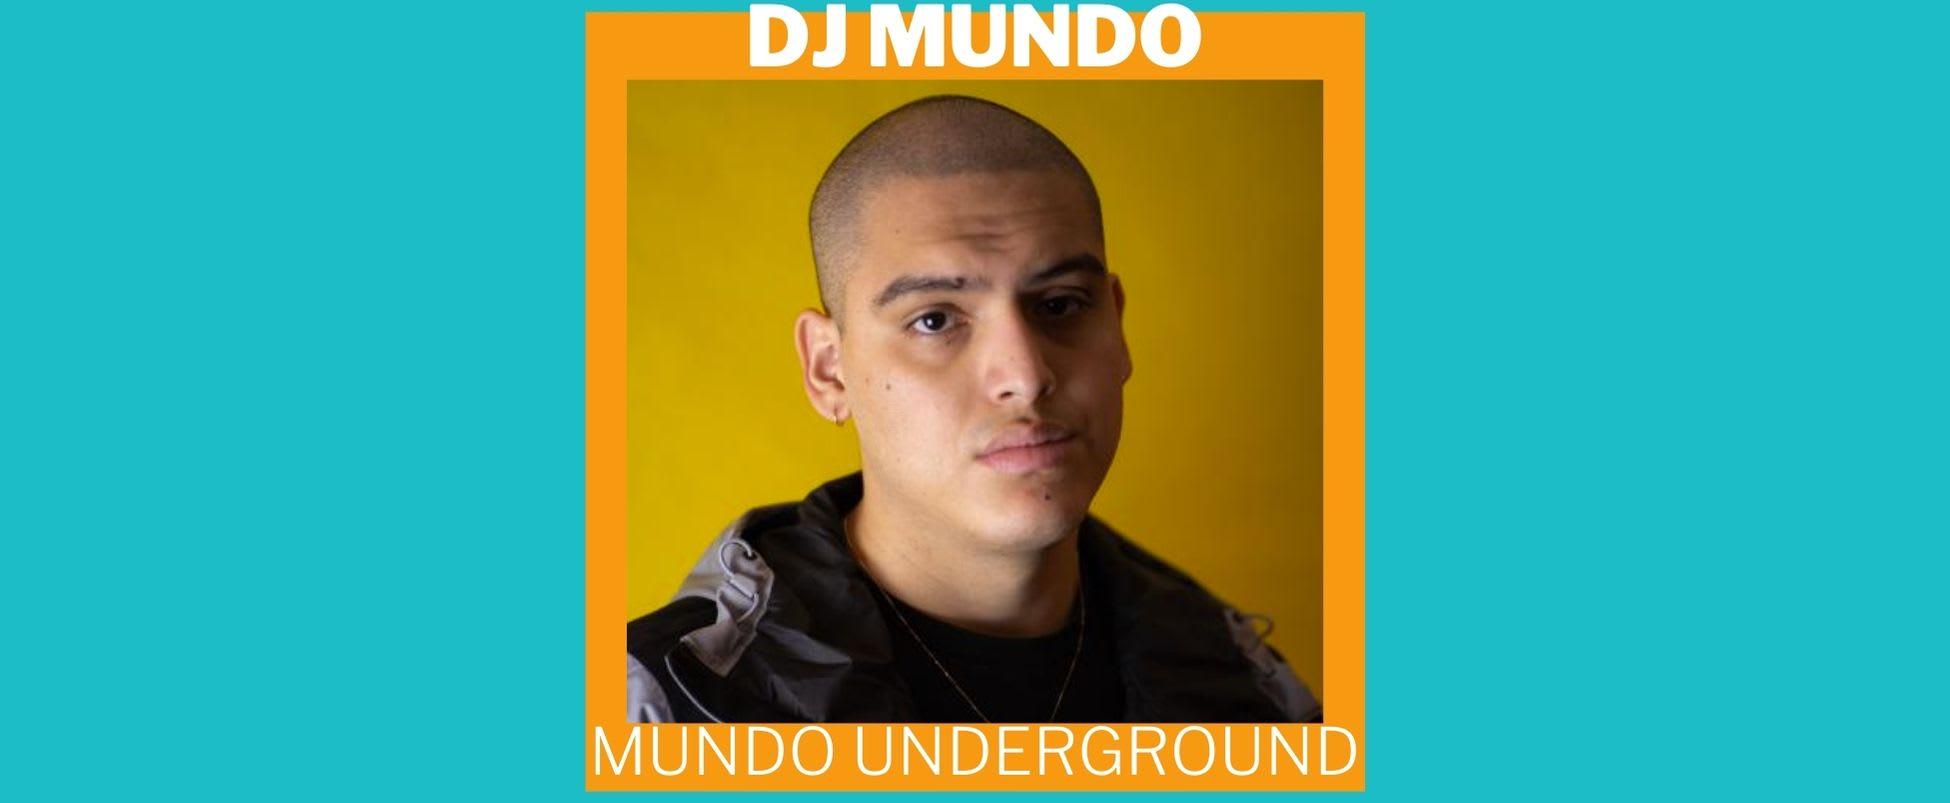 Show Spotlight: MUNDO UNDERGROUND with DJ MUNDO